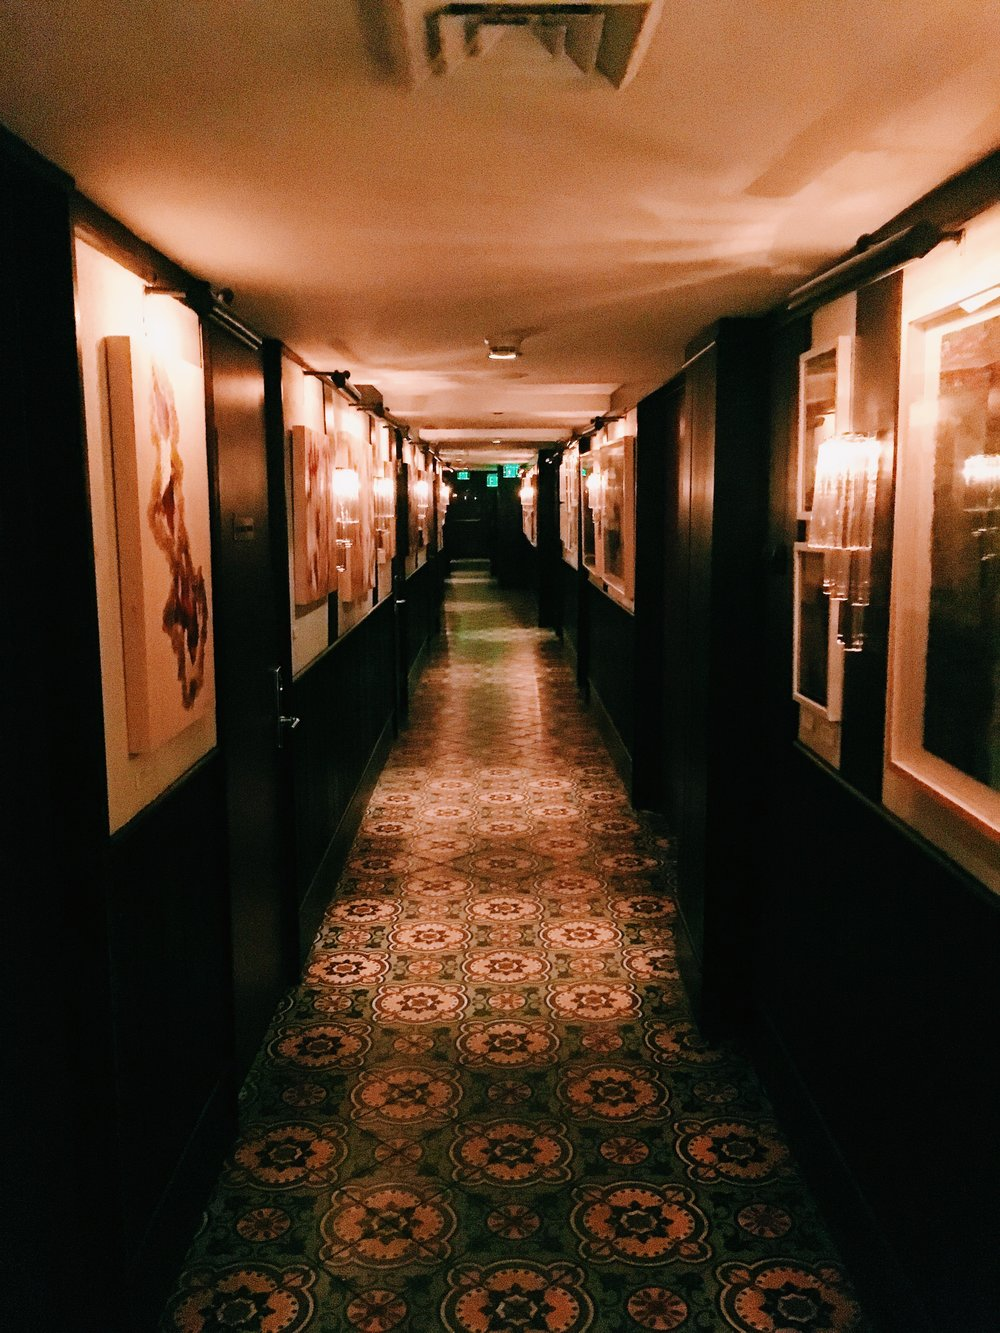 soho beach house tiles wall lights artwork.jpg